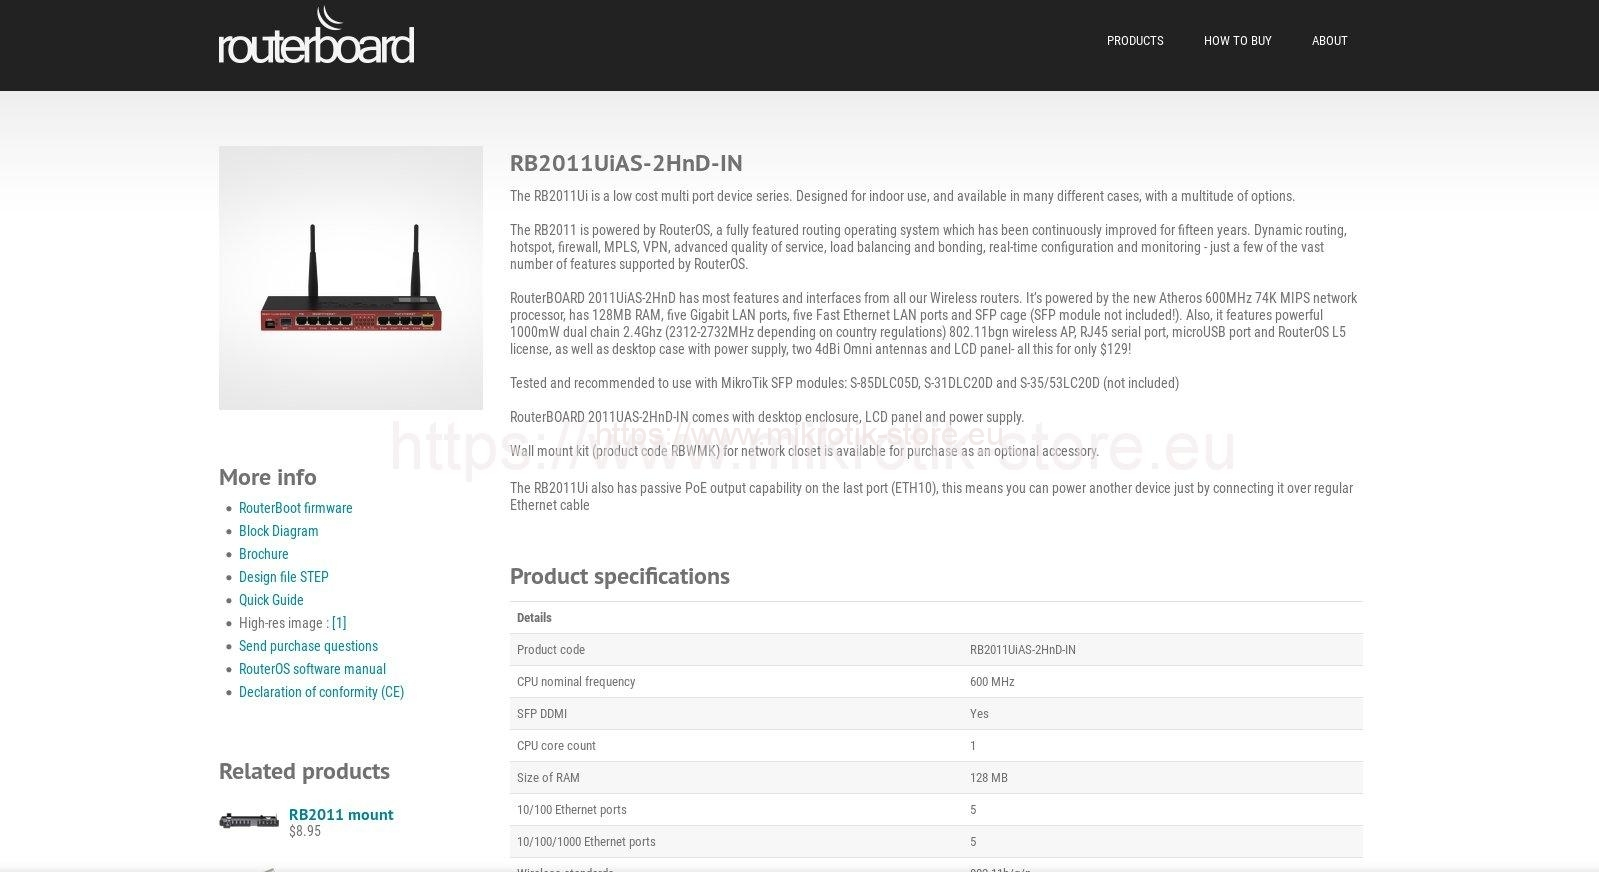 mikrotik-store-eu-routerboard-com1